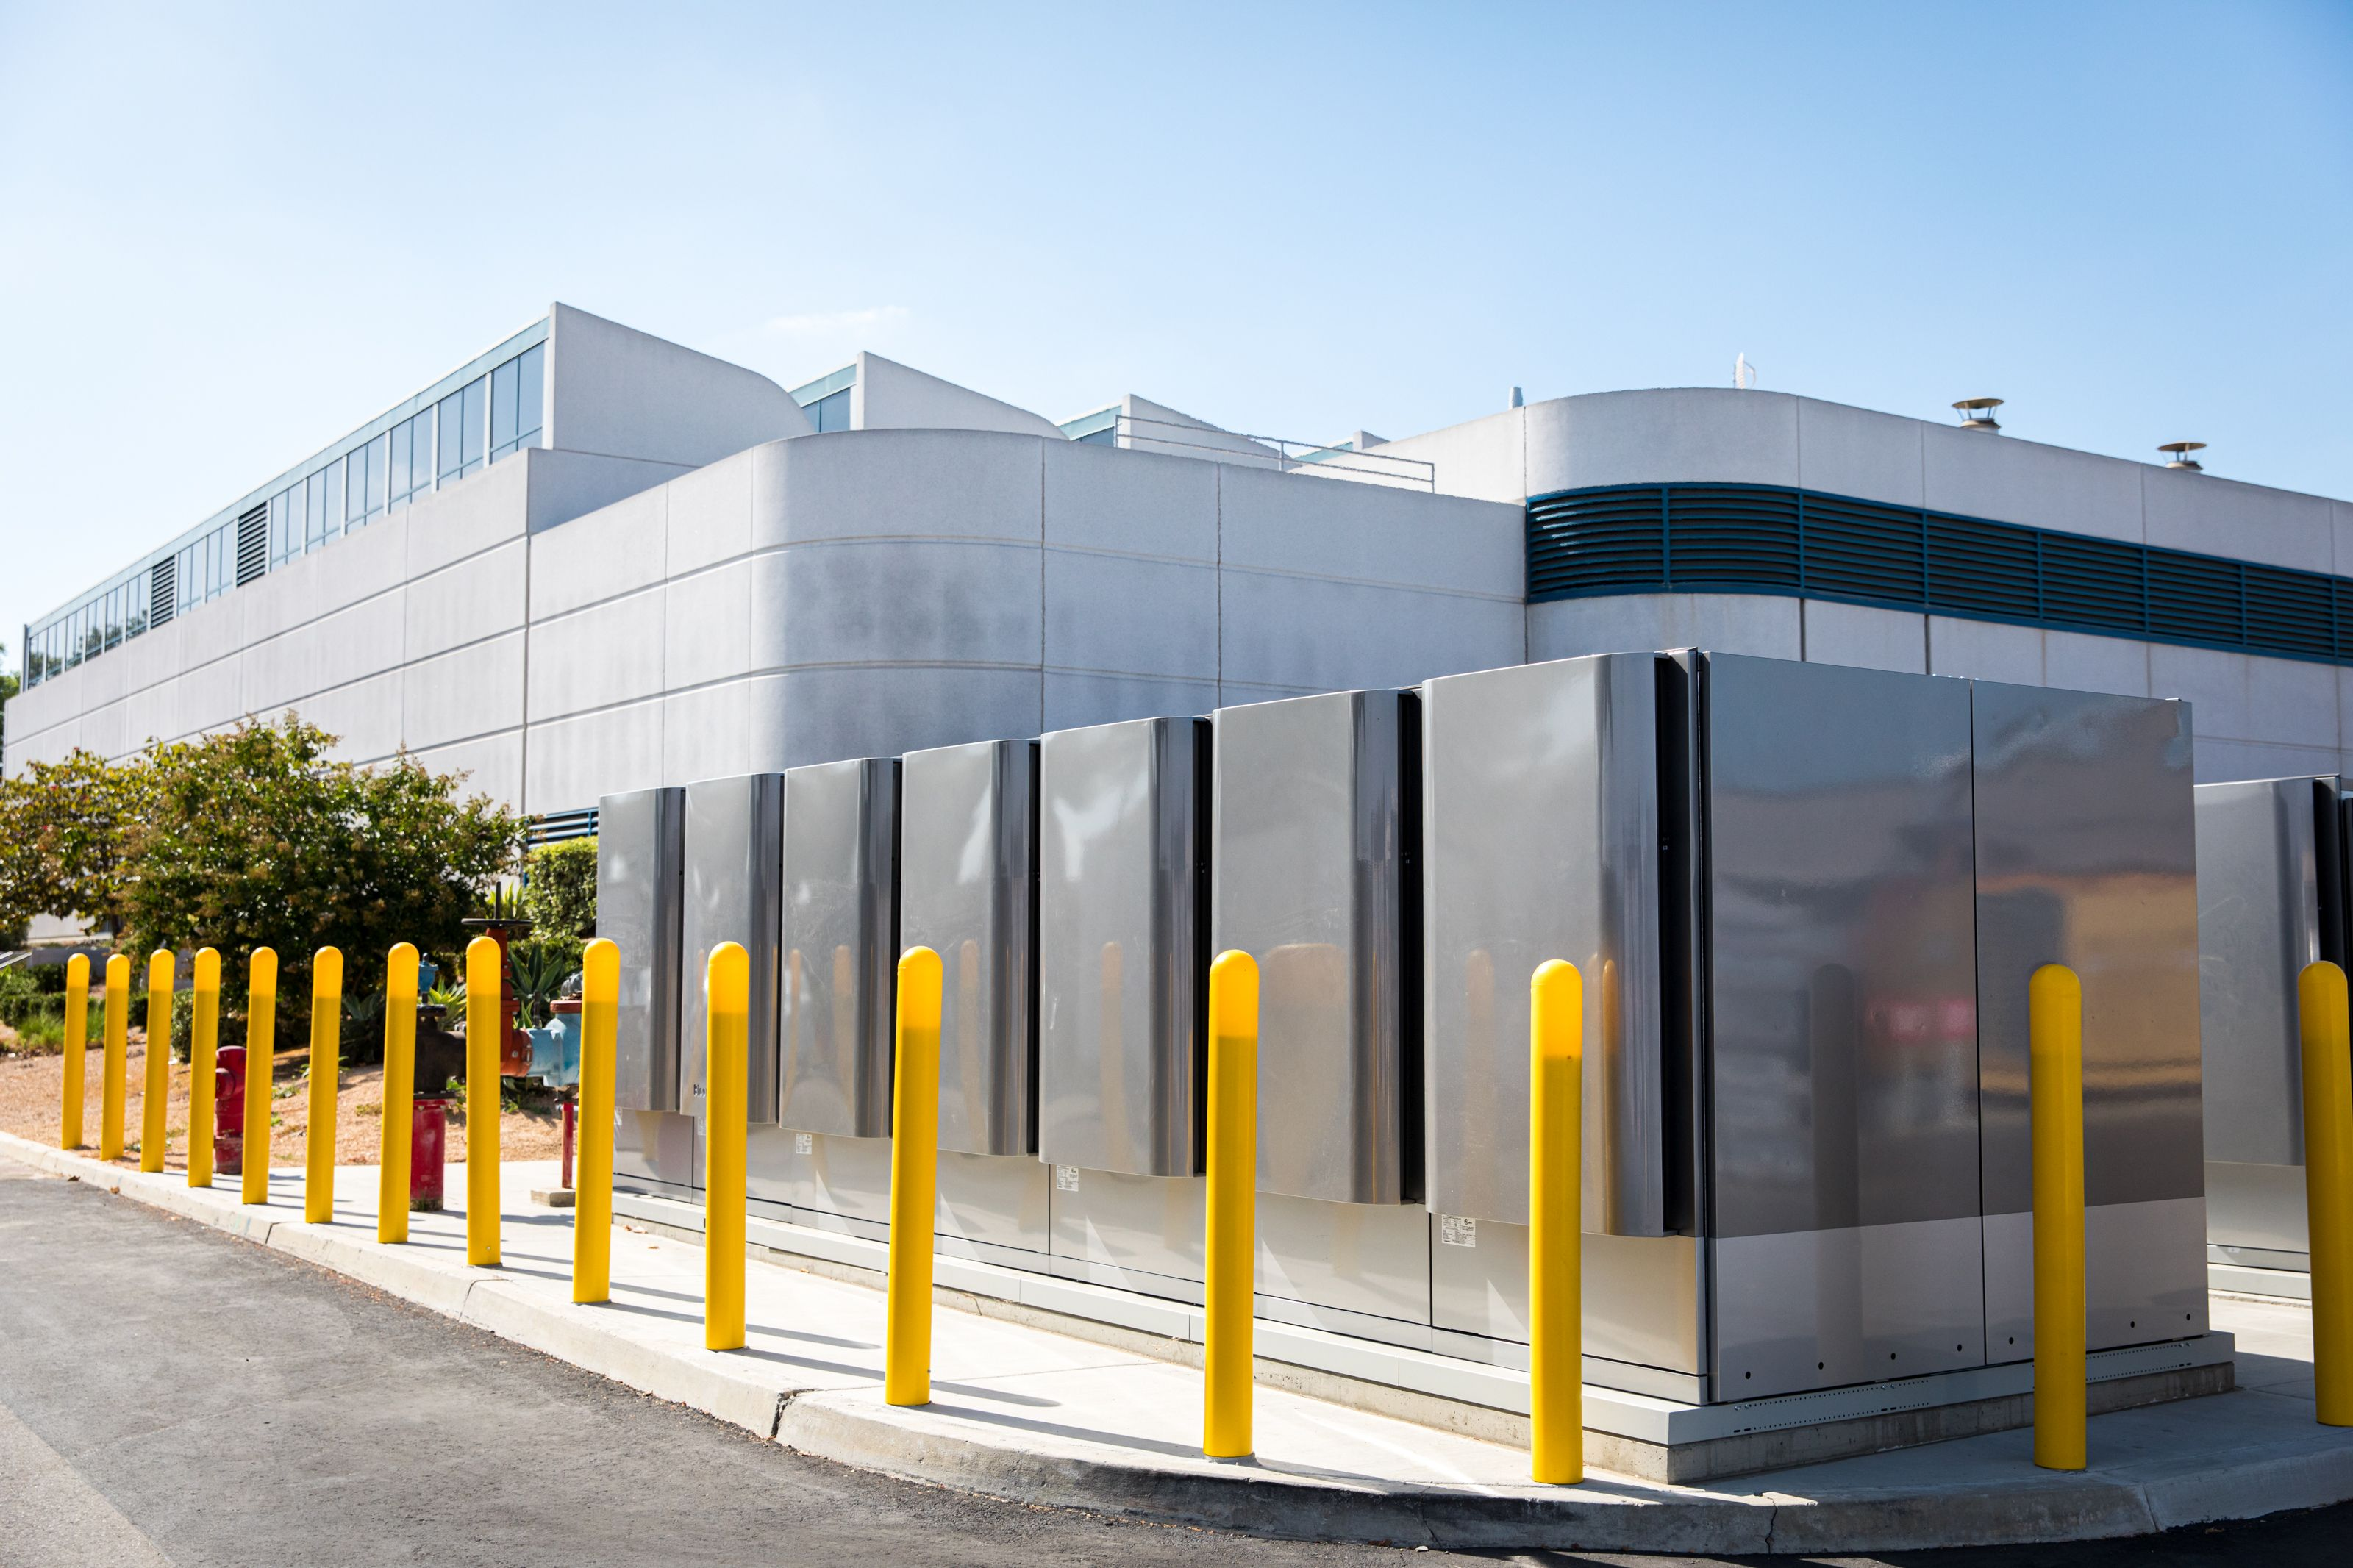 SoCalGas Powers 2 Facilities with Bloom Energy